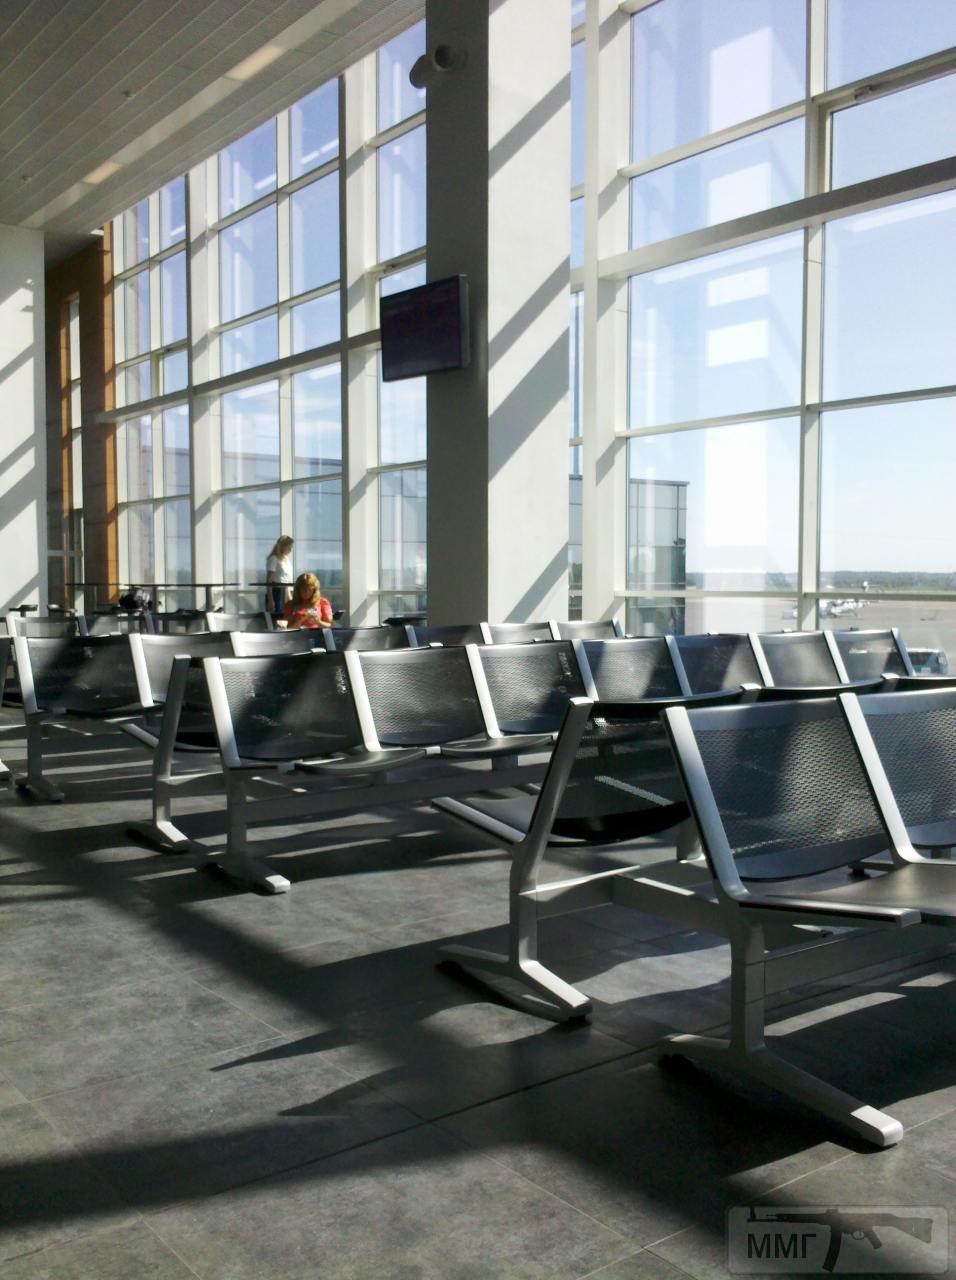 34319 - Донецкий аэропорт, новый терминал